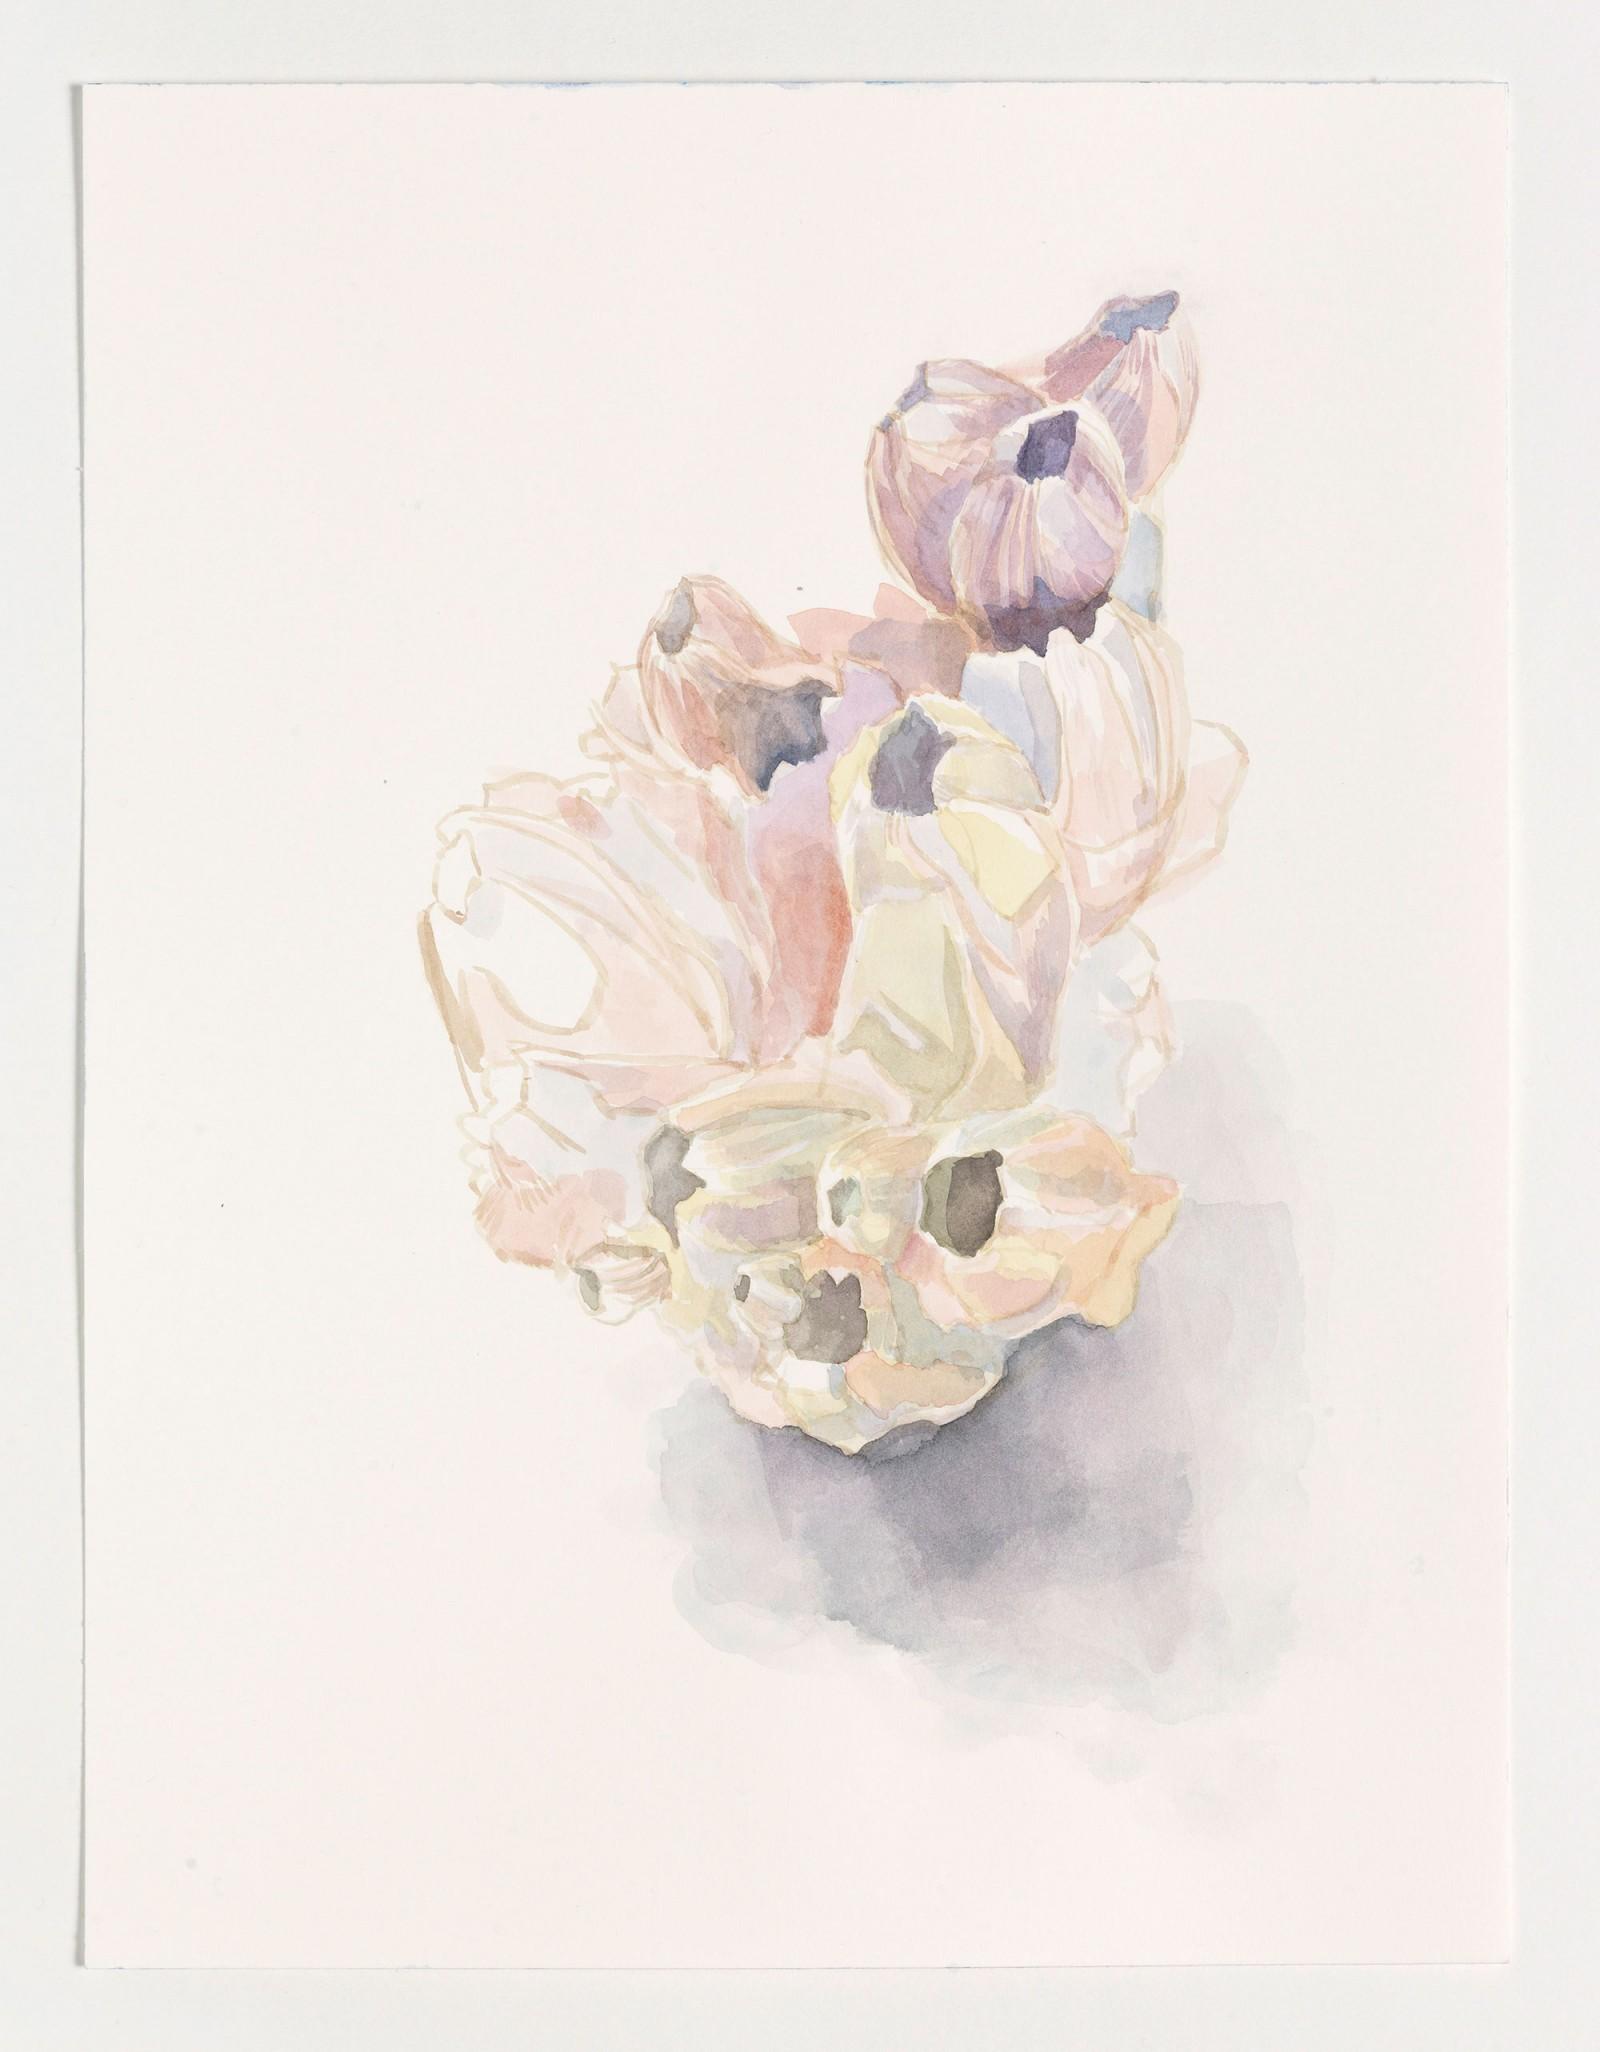 Kim Nekarda: untitled, 2015, watercolour on paper, 41 x 31 cm